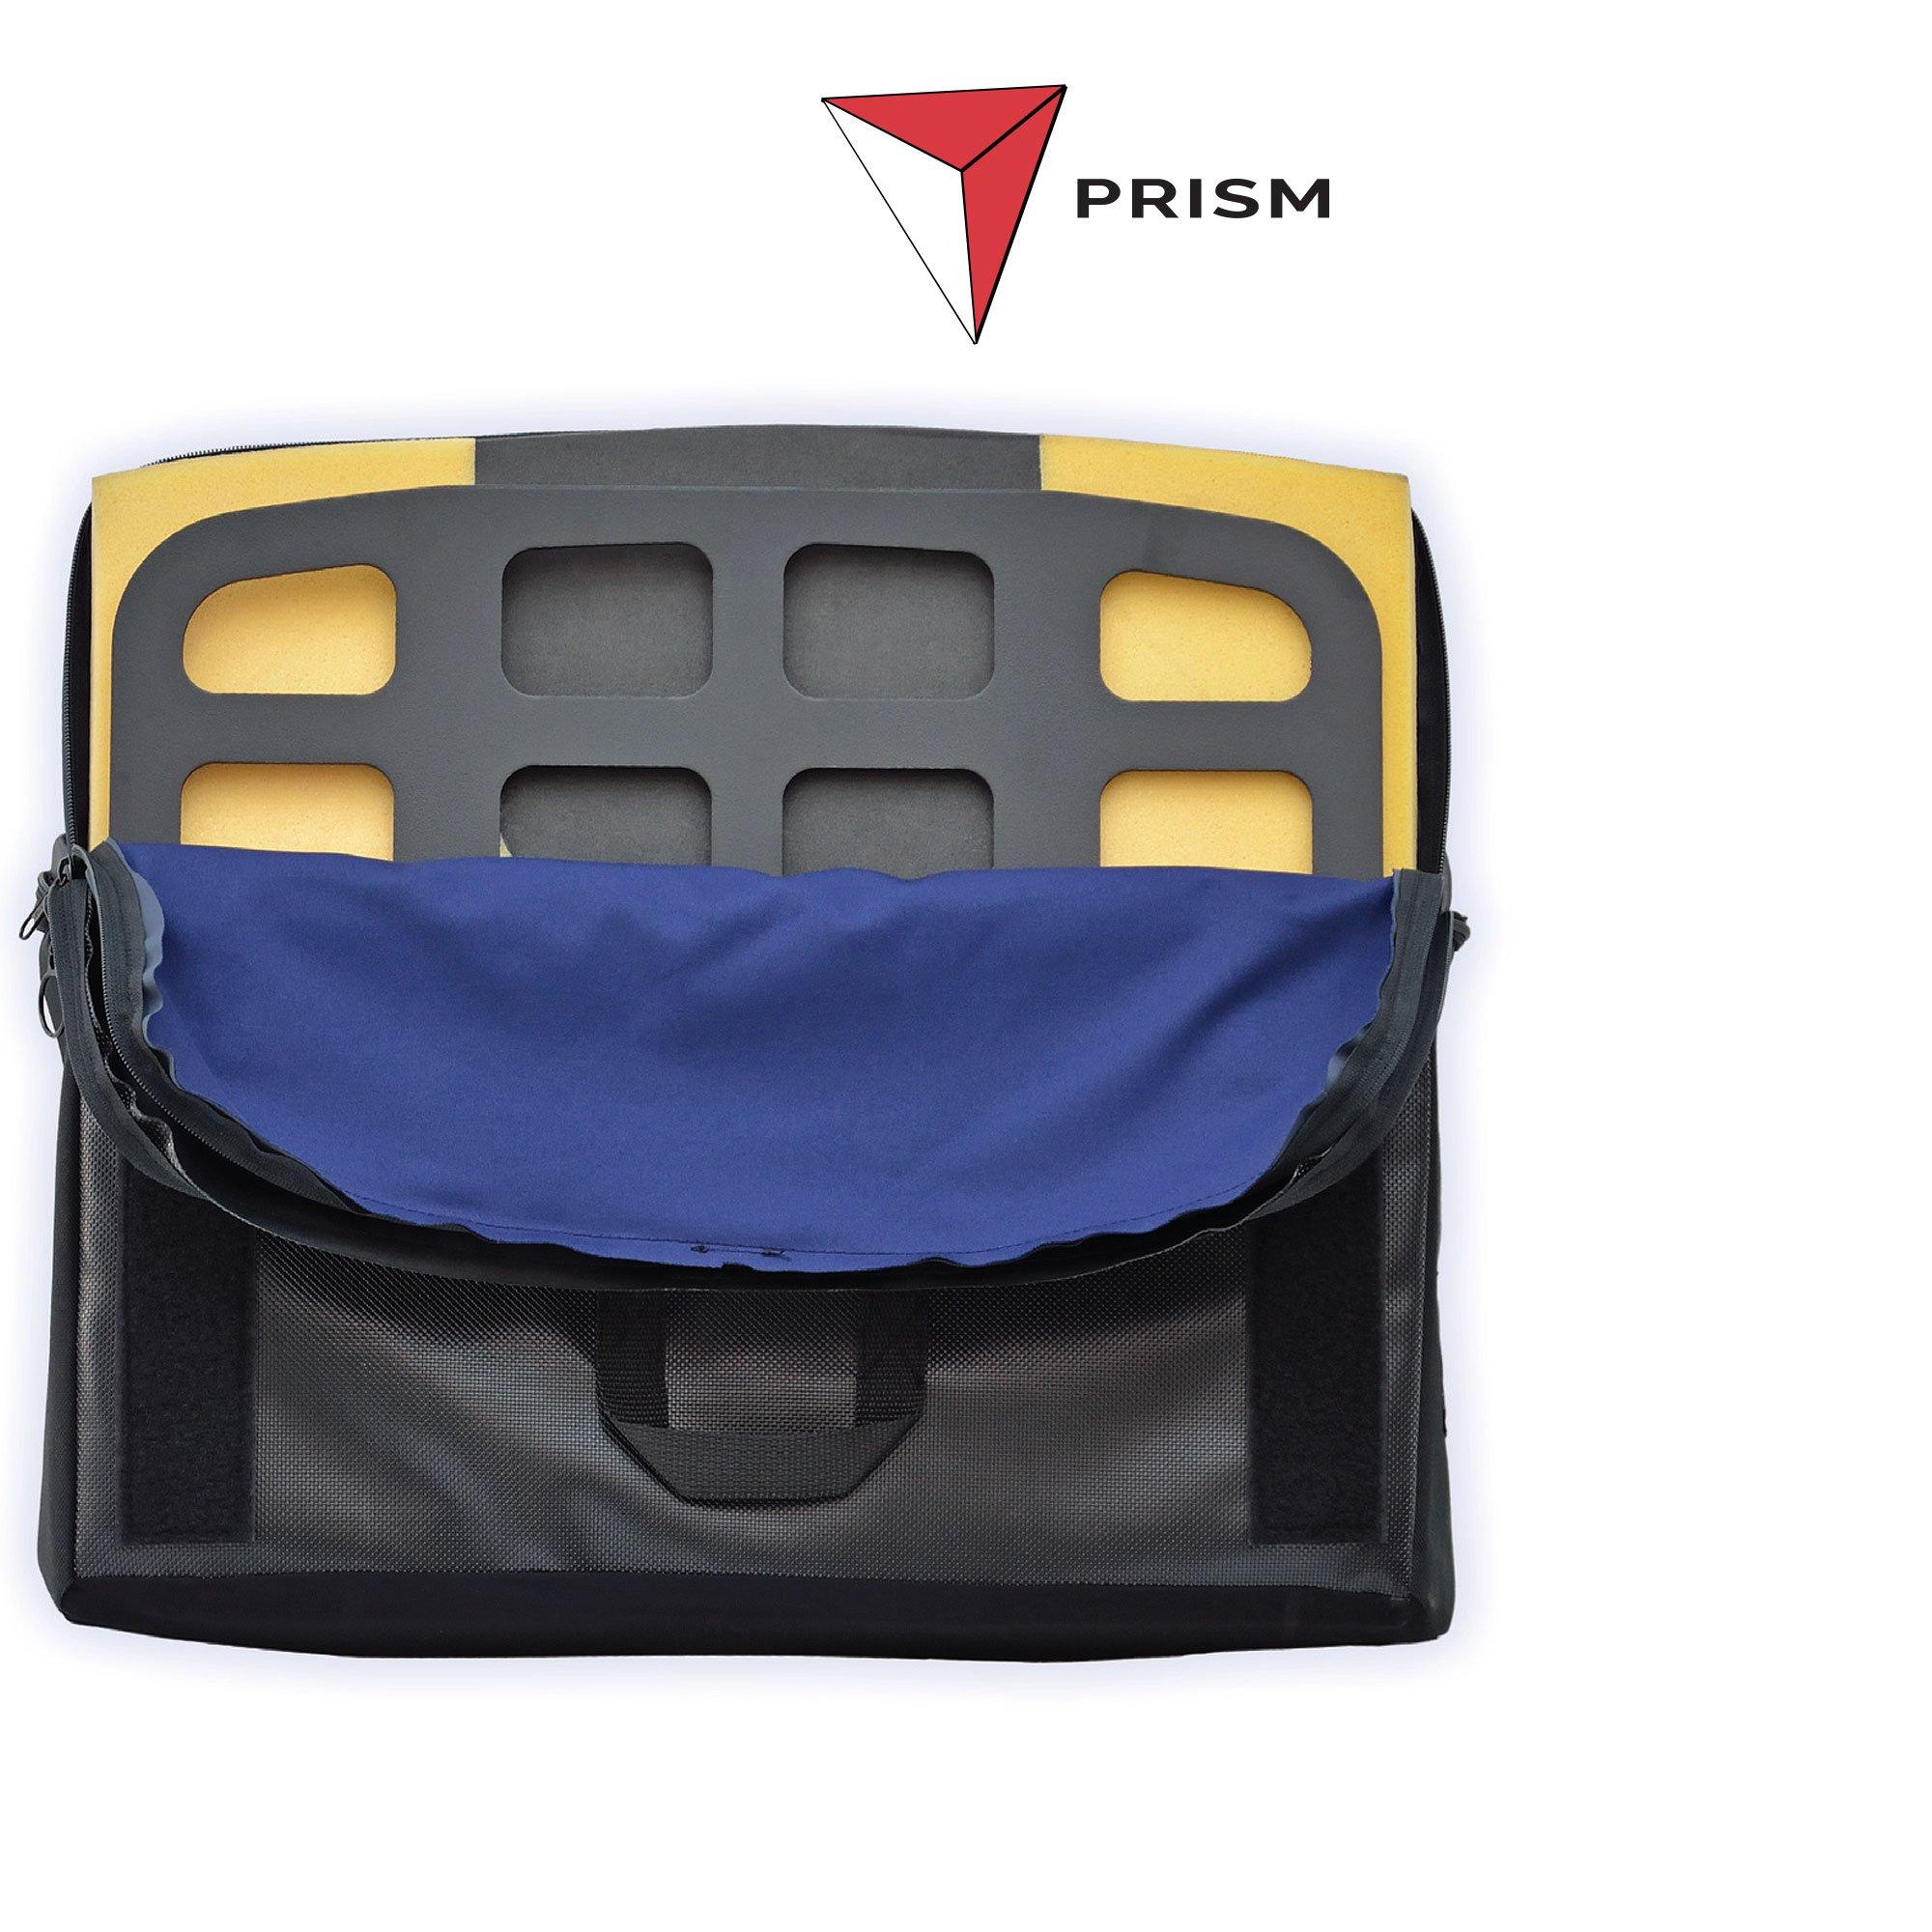 Cushion Wheelchair Prism Rigidizer